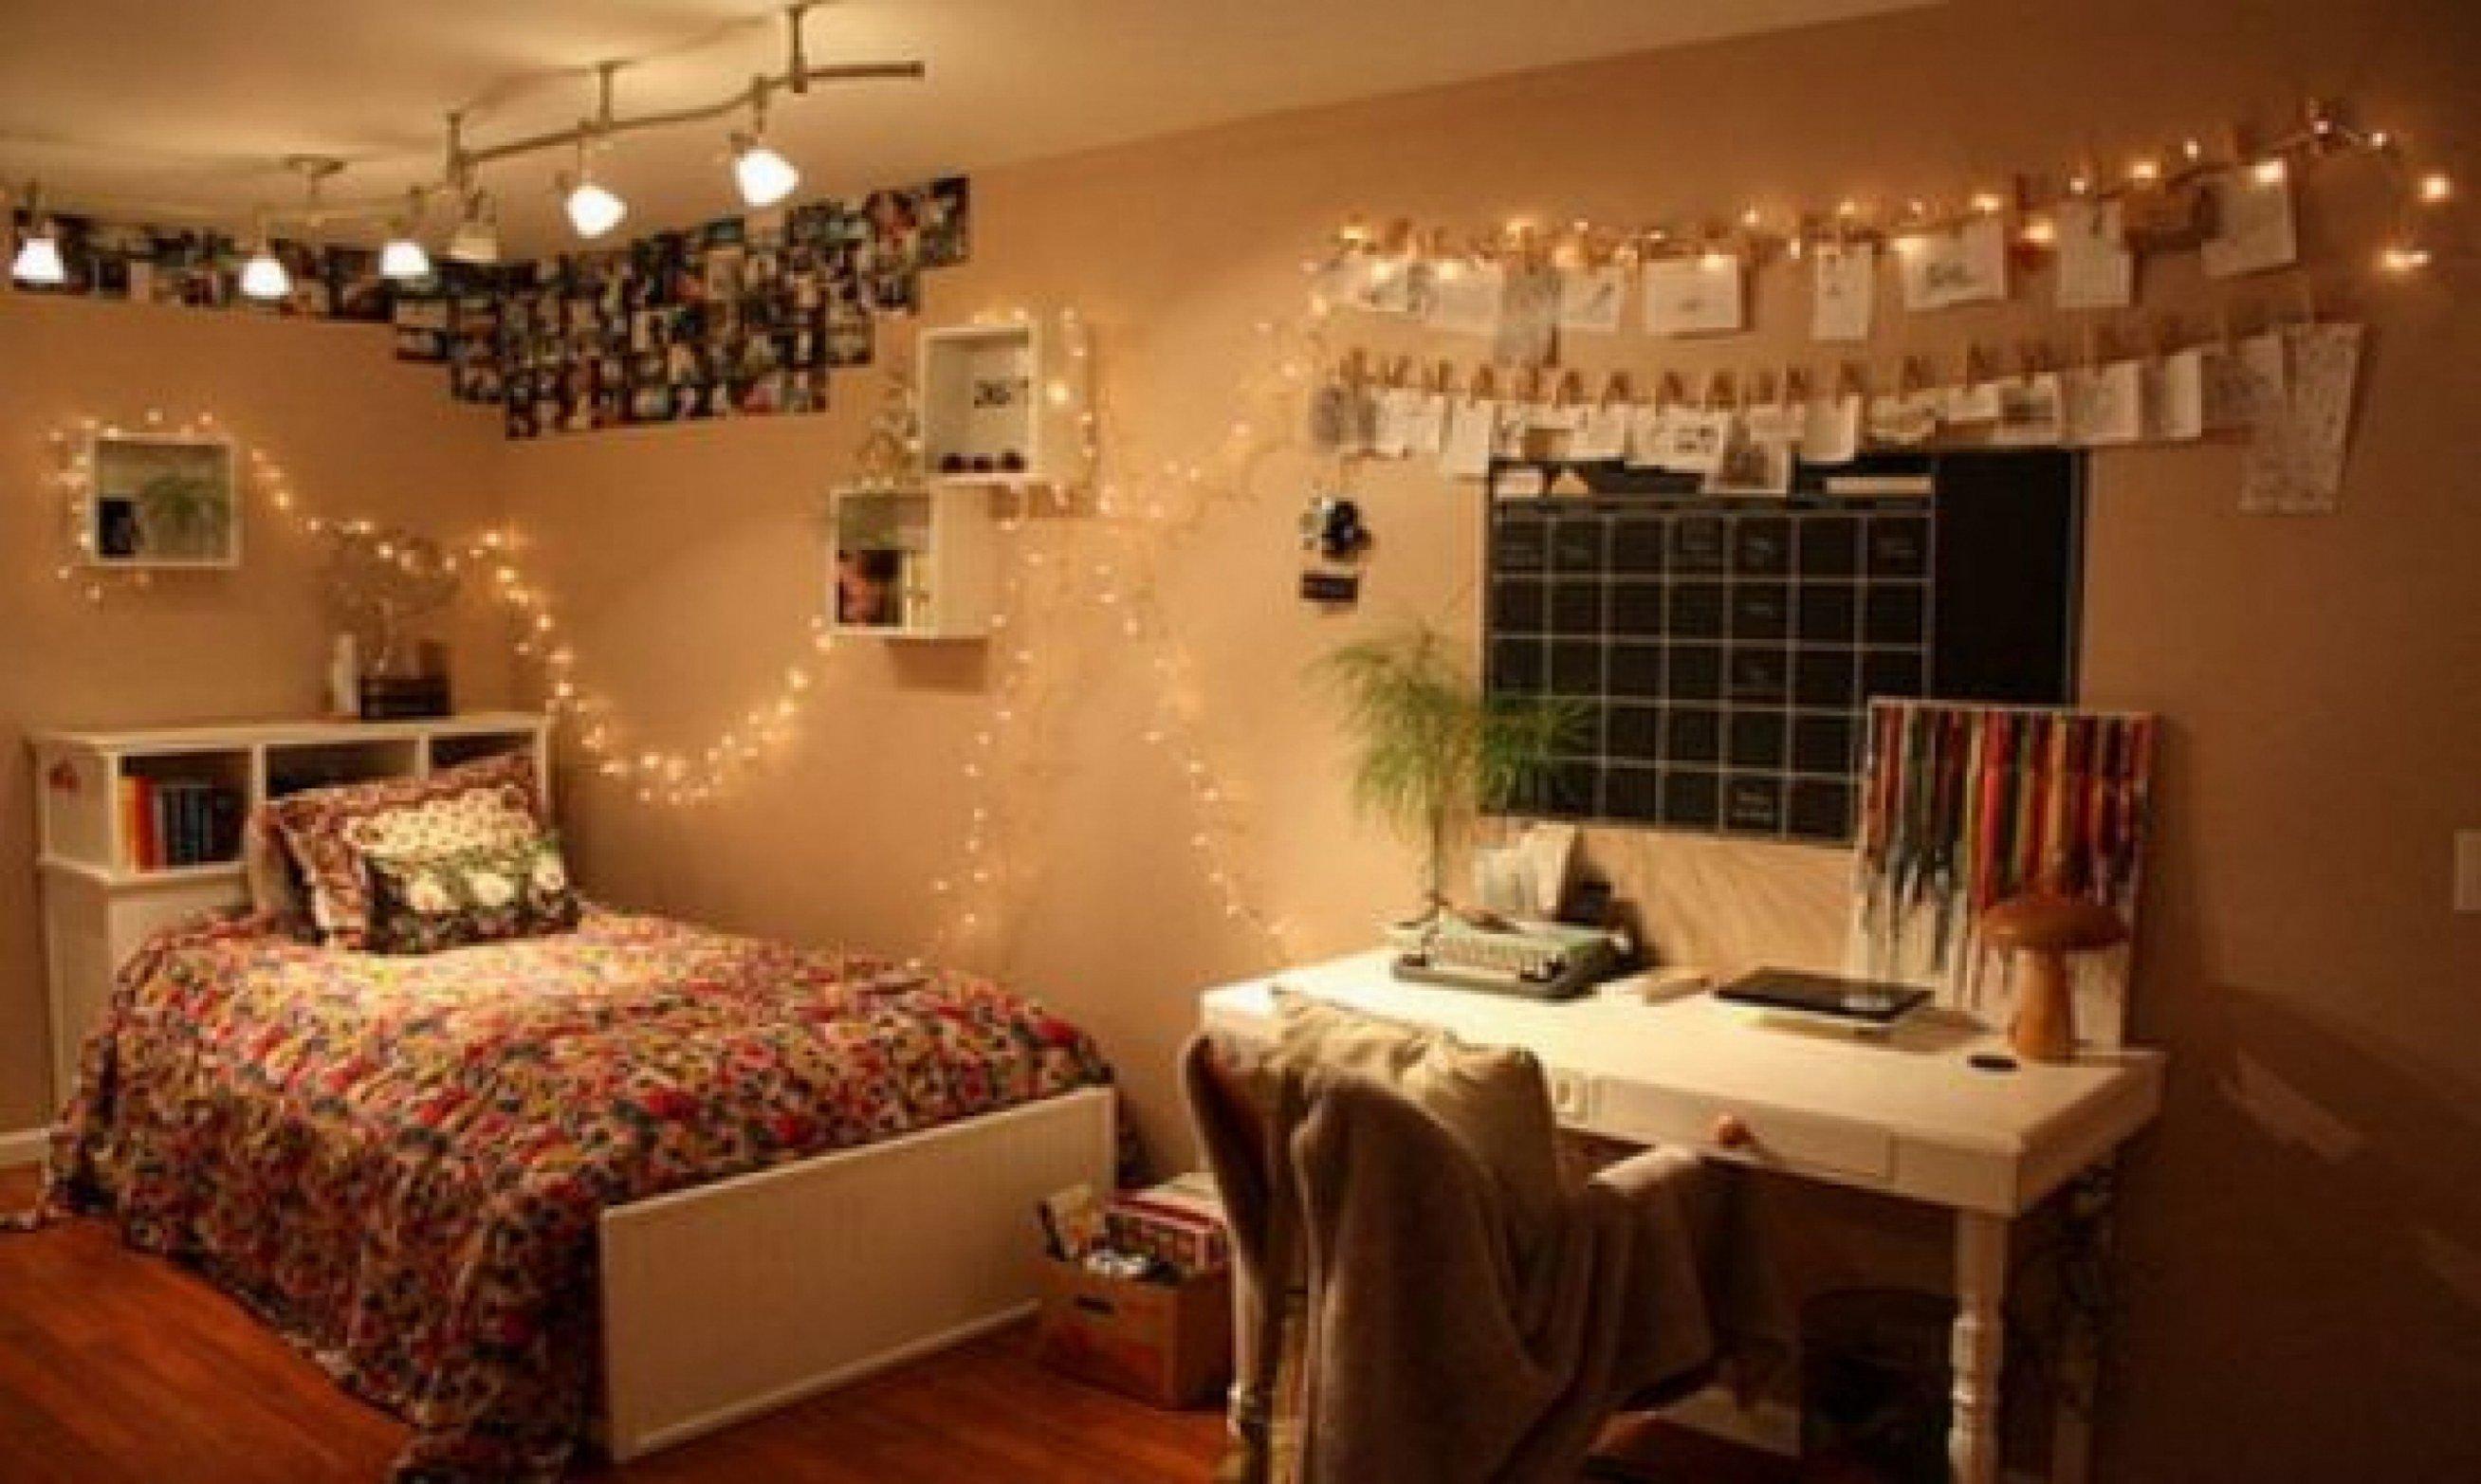 Kids Bedroom for Girls Luxury Cool Girl Room Ideas Bedroom Ideas Kids Desk Tar Fresh Desk